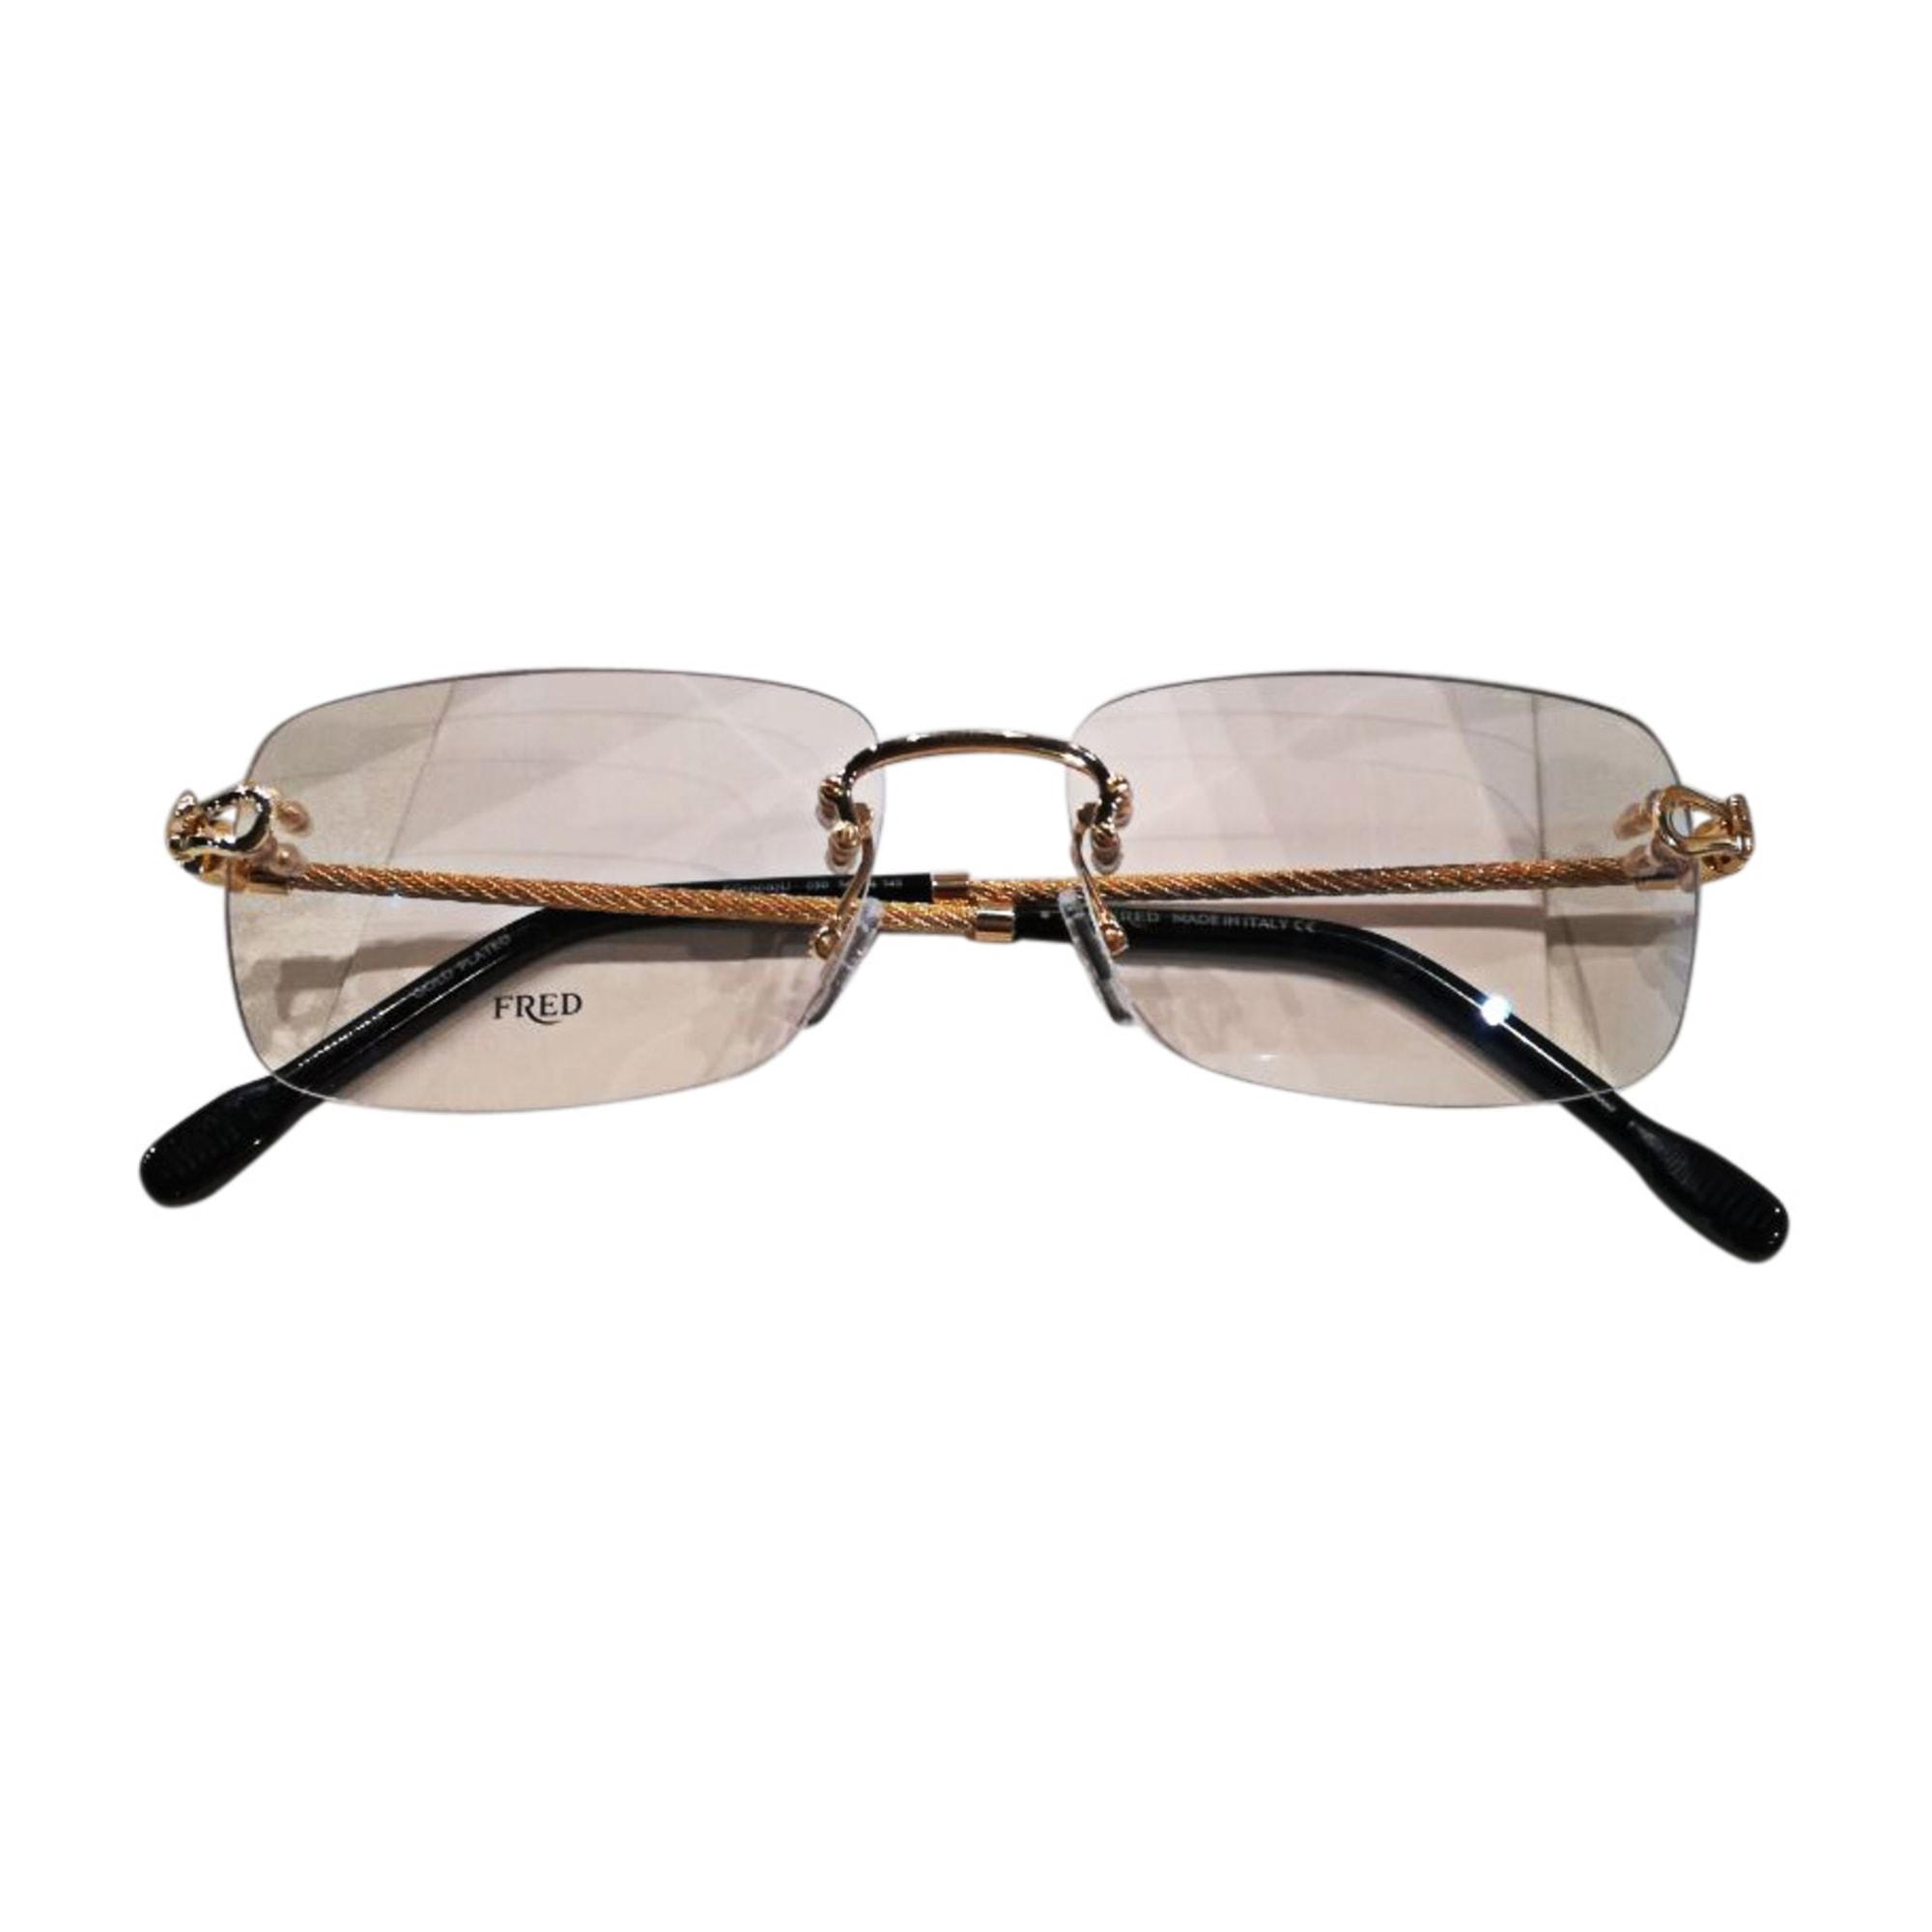 Eyeglass Frames FRED Golden, bronze, copper